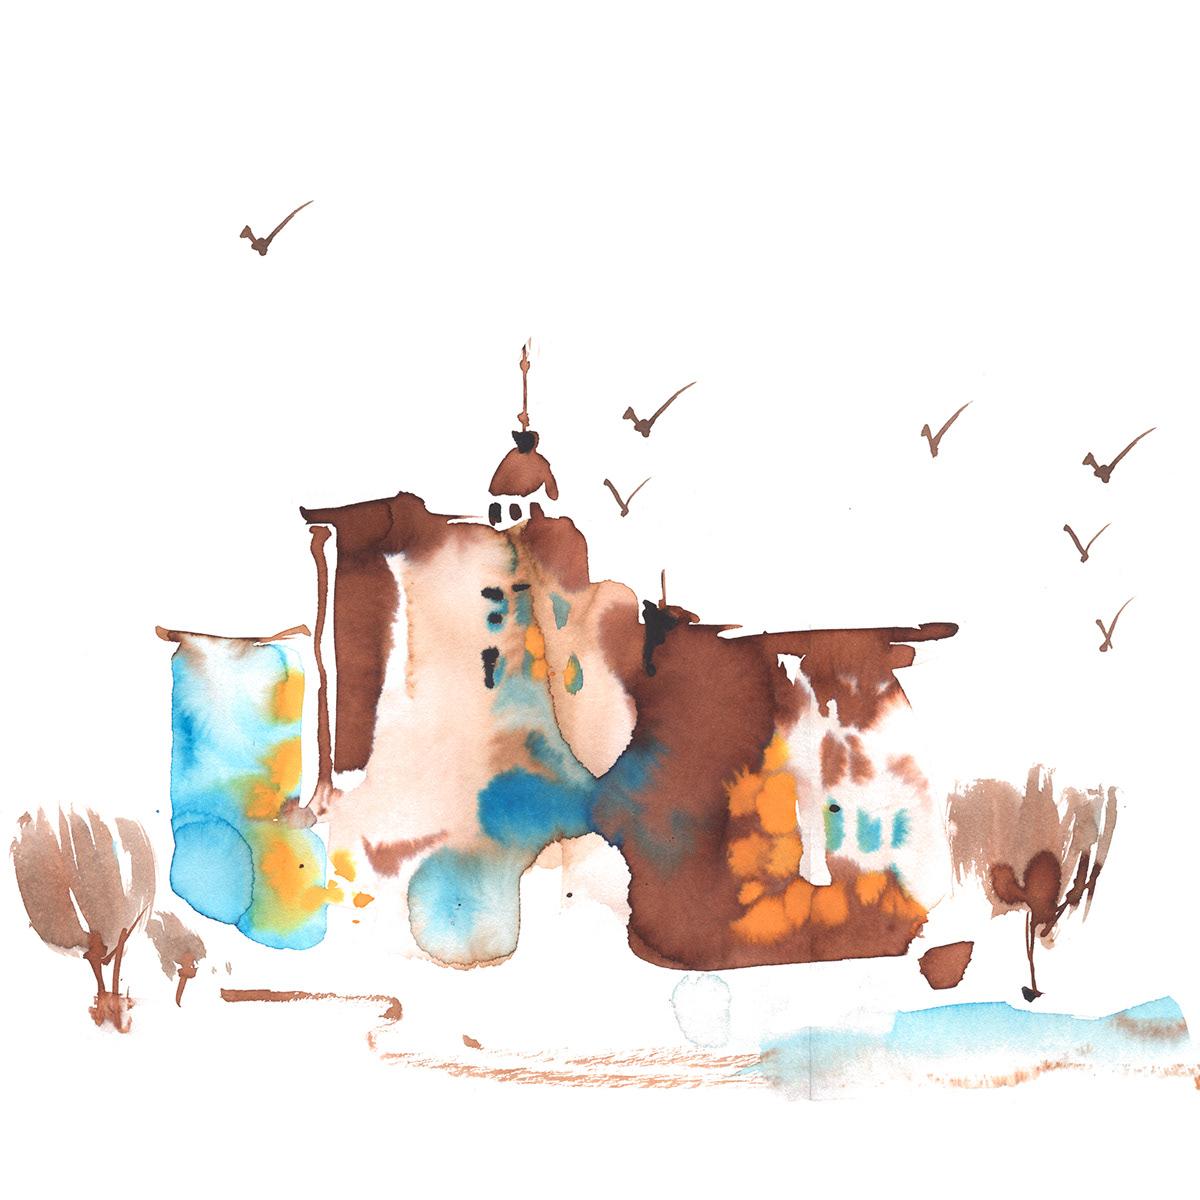 city COOL GRAPHIC houses ILLUSTRATION  pattern print watercolor watercolor print домики иллюстрация